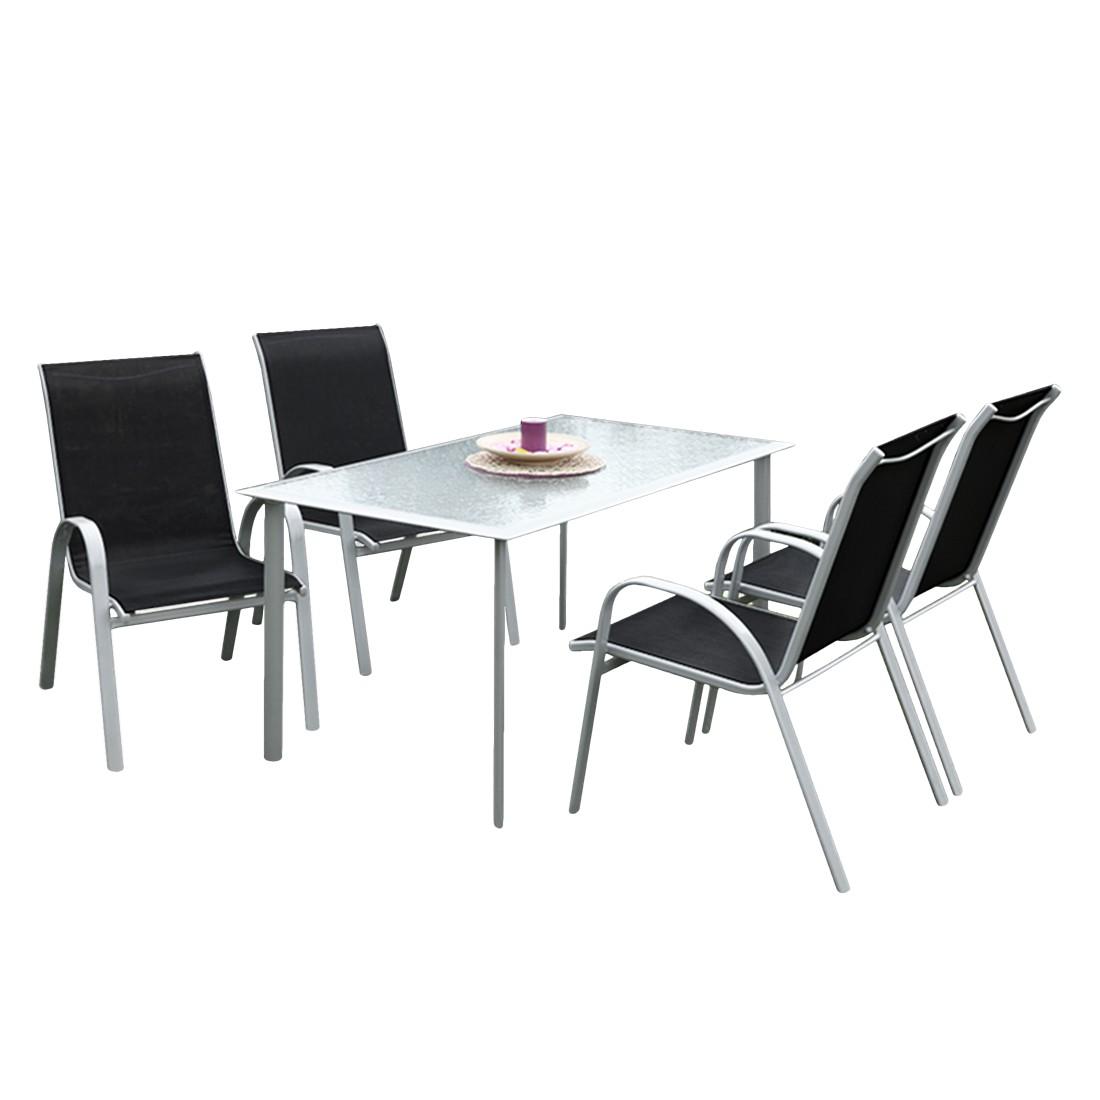 Gartensitzgruppe Avellino I (5-teilig) - Stahl - Schwarz, Merxx